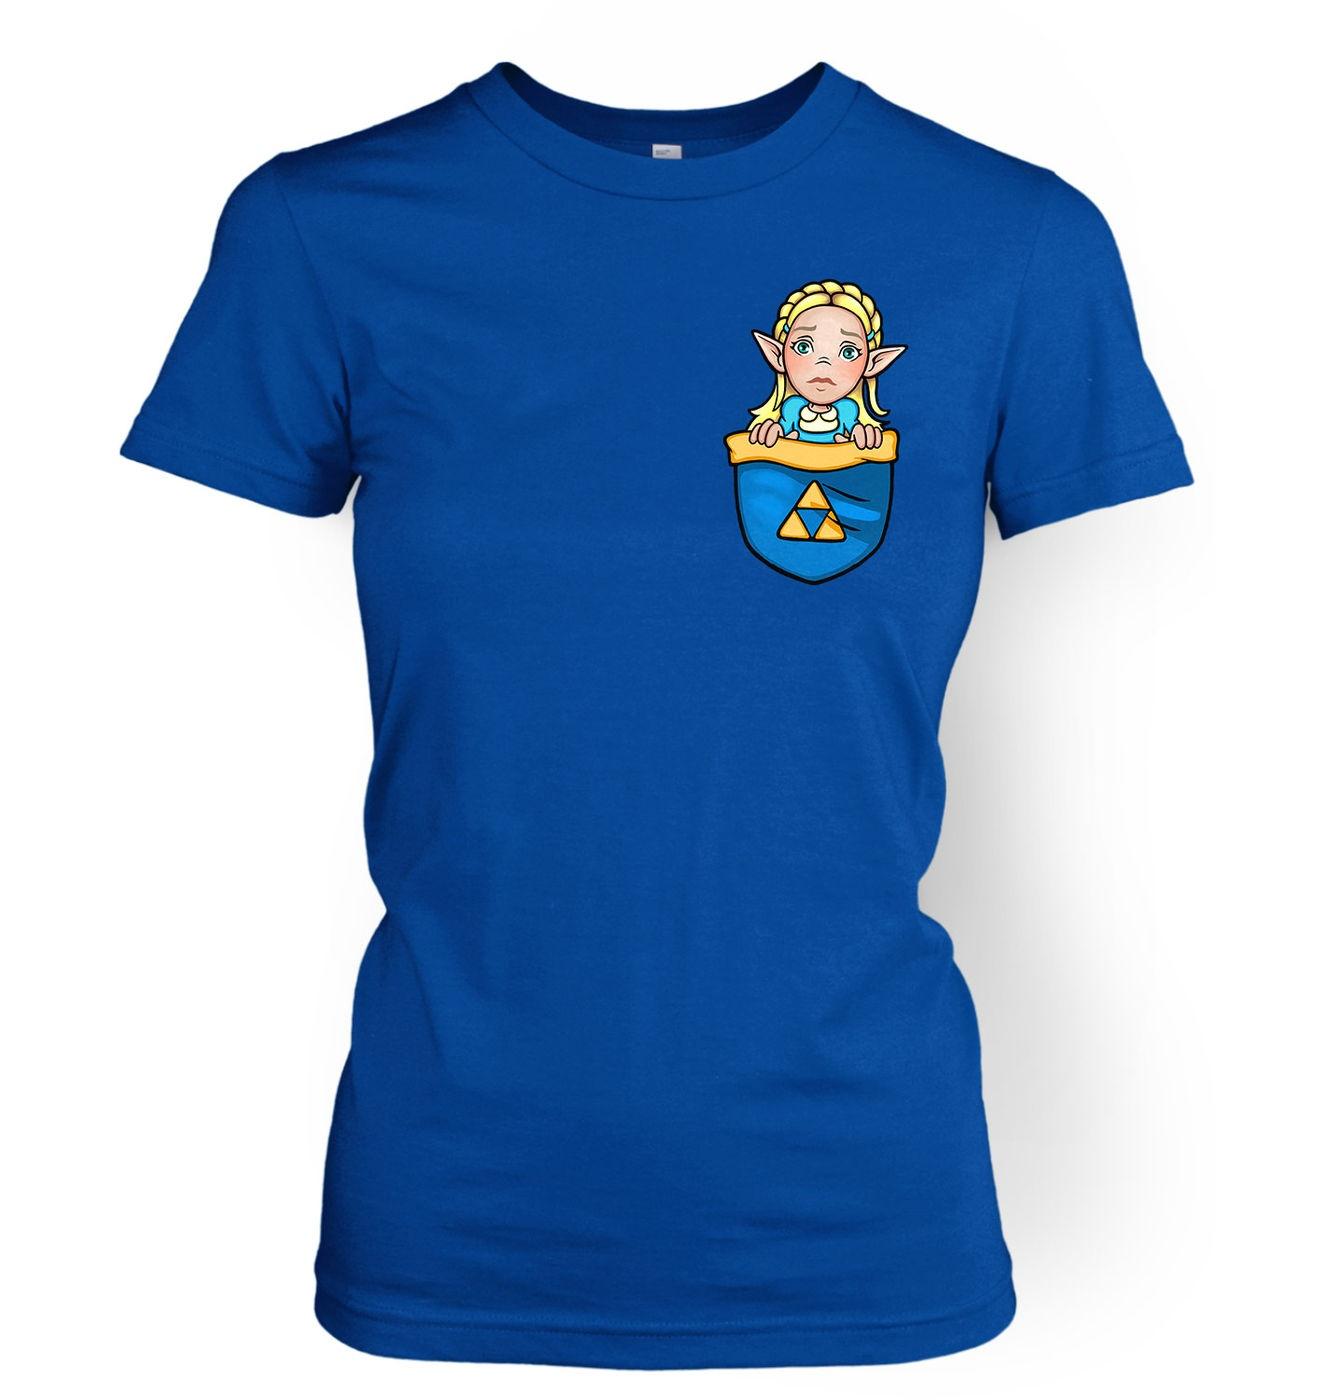 Pocket Zelda women's t-shirt by Something Geeky